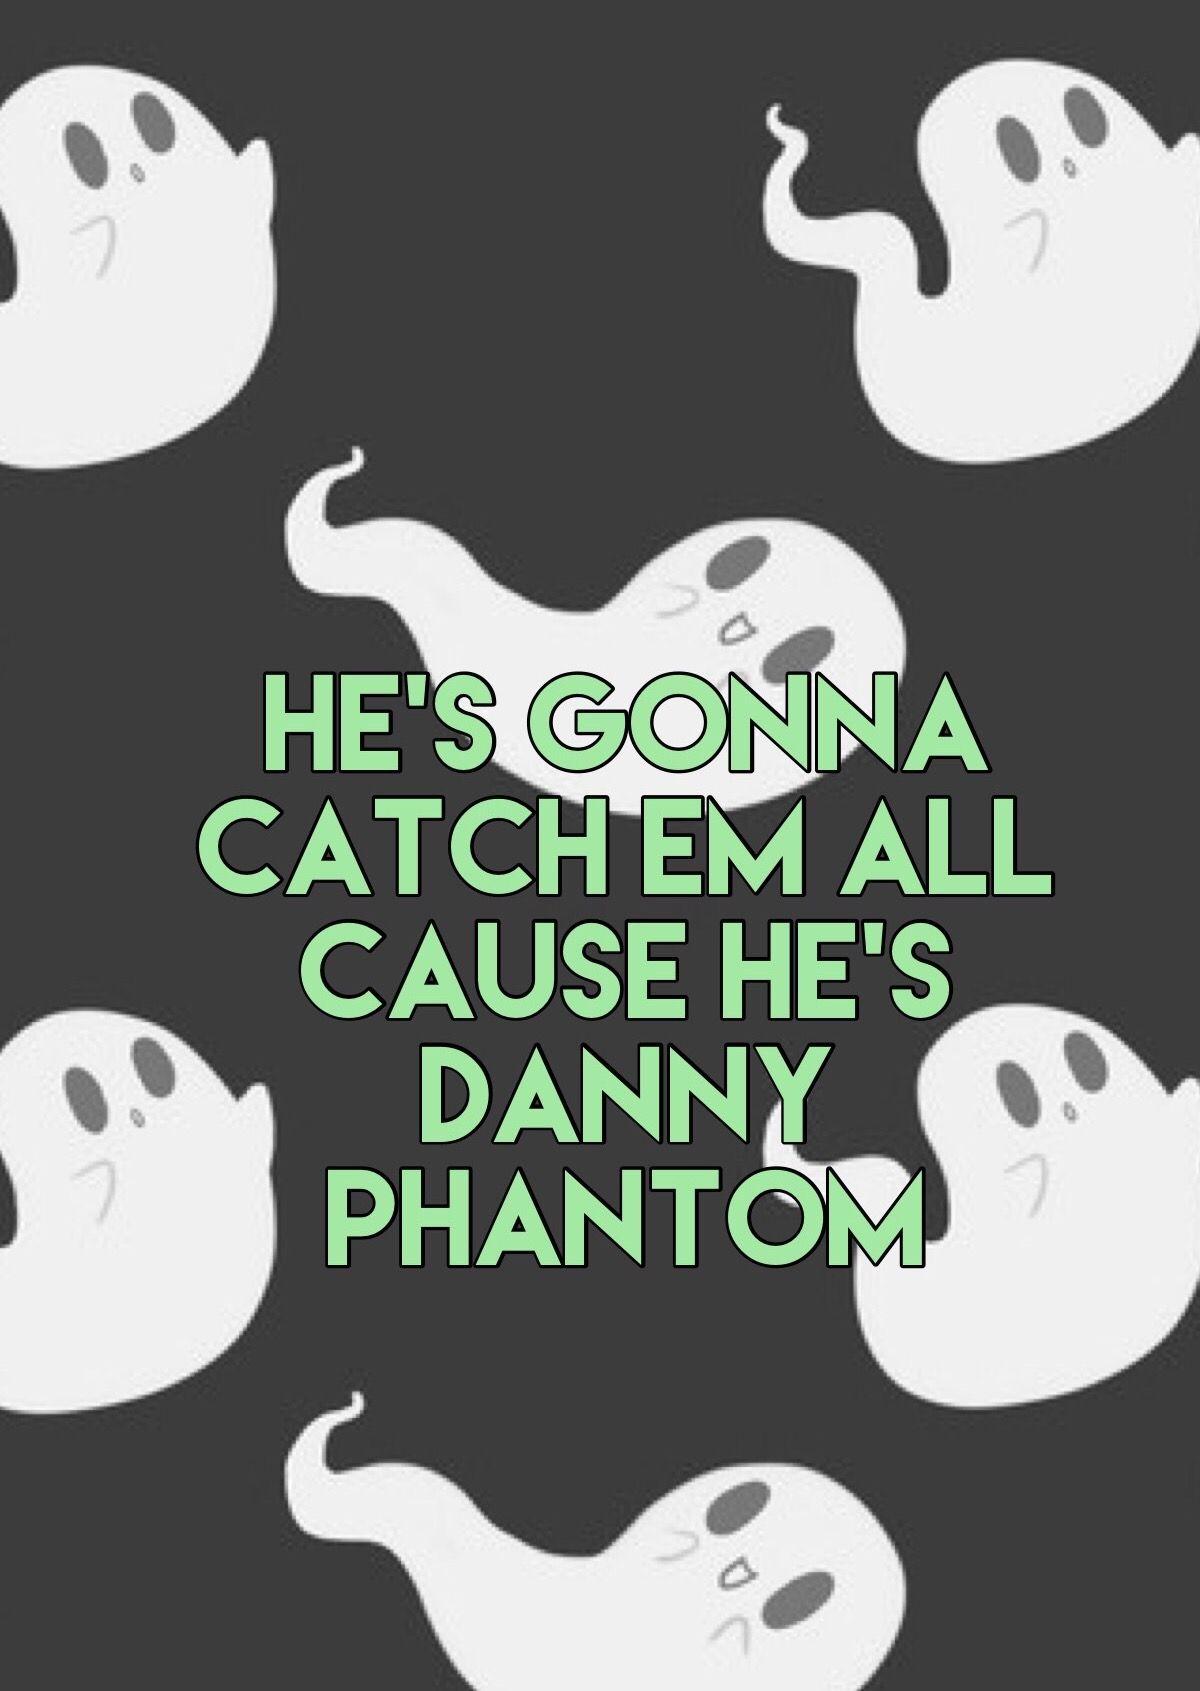 Nickelodeon Song Lyrics : nickelodeon, lyrics, Danny, Phantom, Theme, Song~, Nickelodeon, #DannyPhantom, #Wallpapers, #LyricWallpapers, #Lyrics, #oldnickshows, Phantom,